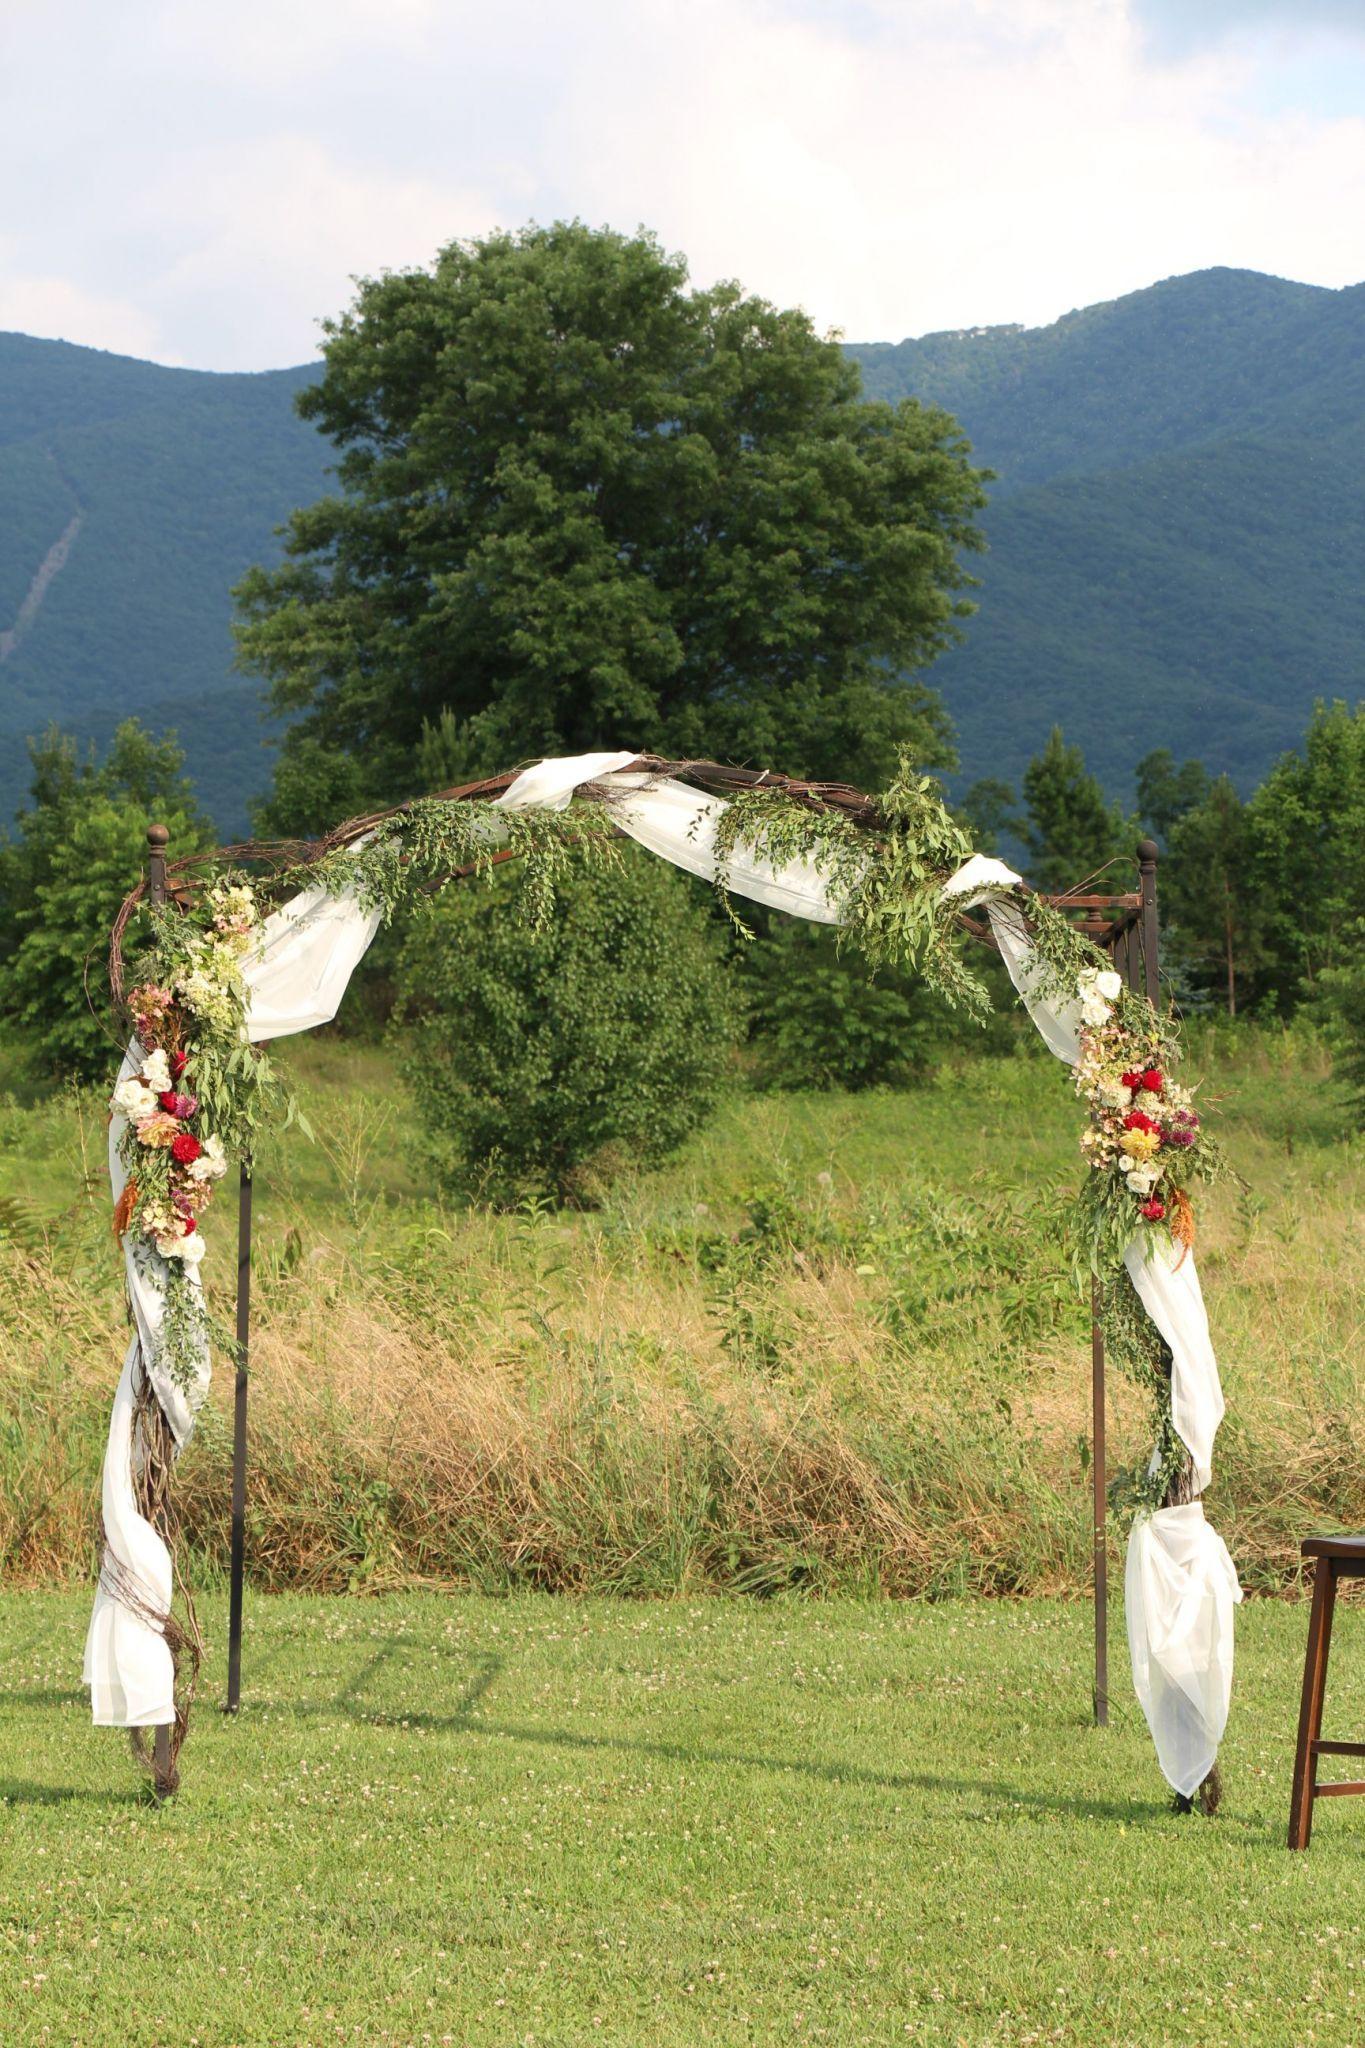 Wildflowers arbor -done by Flourish Root @khimairafarm outdoor wedding venue luray, virginia